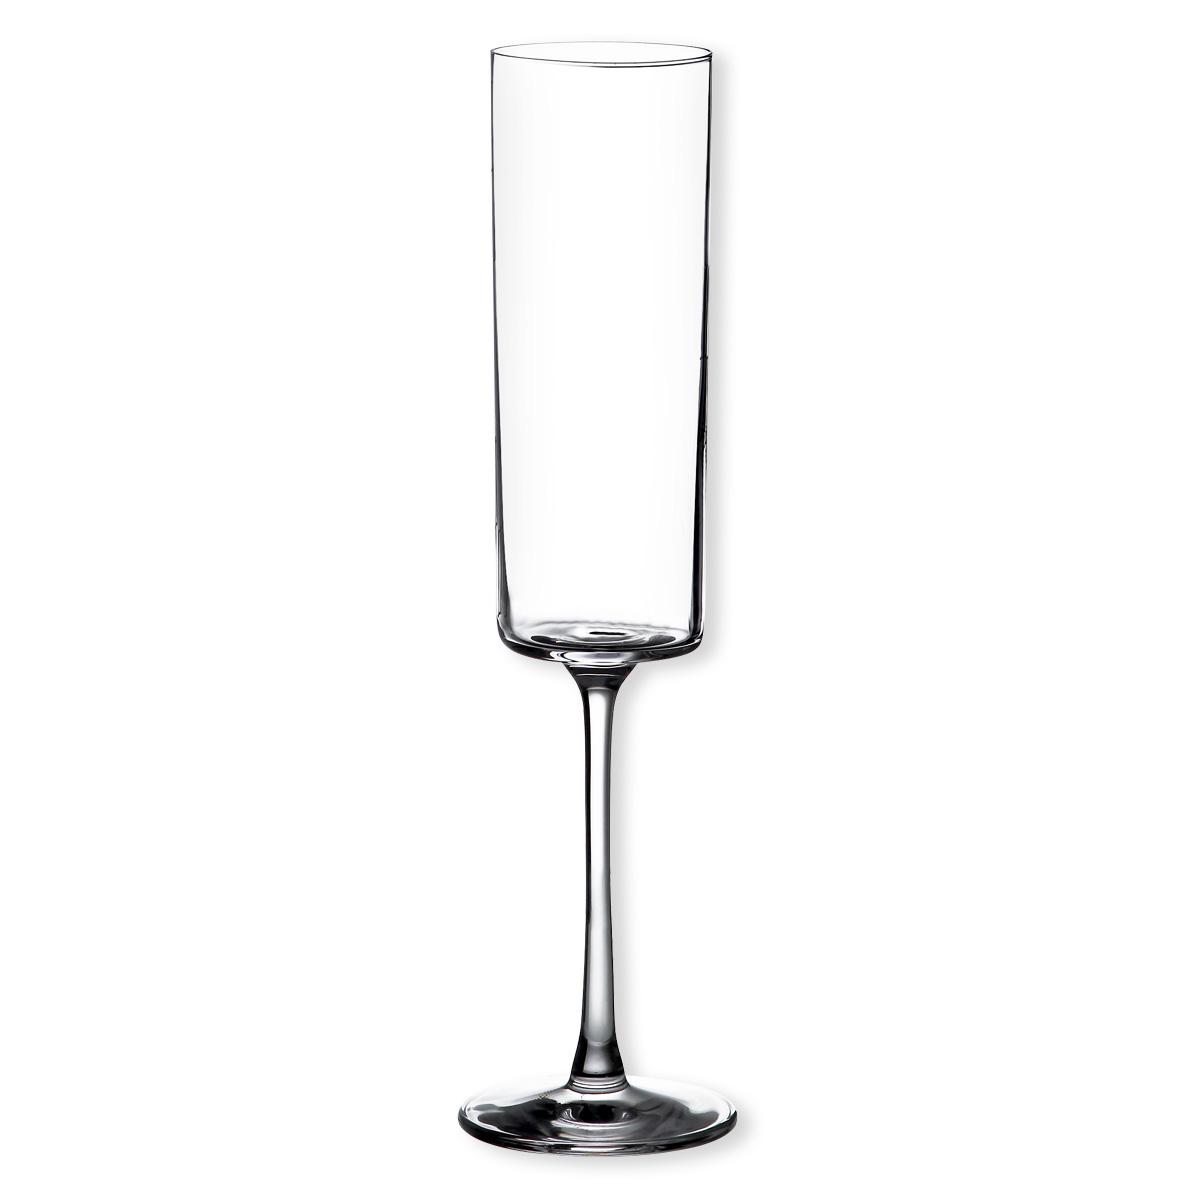 fl te champagne design en cristallin verrerie chic. Black Bedroom Furniture Sets. Home Design Ideas